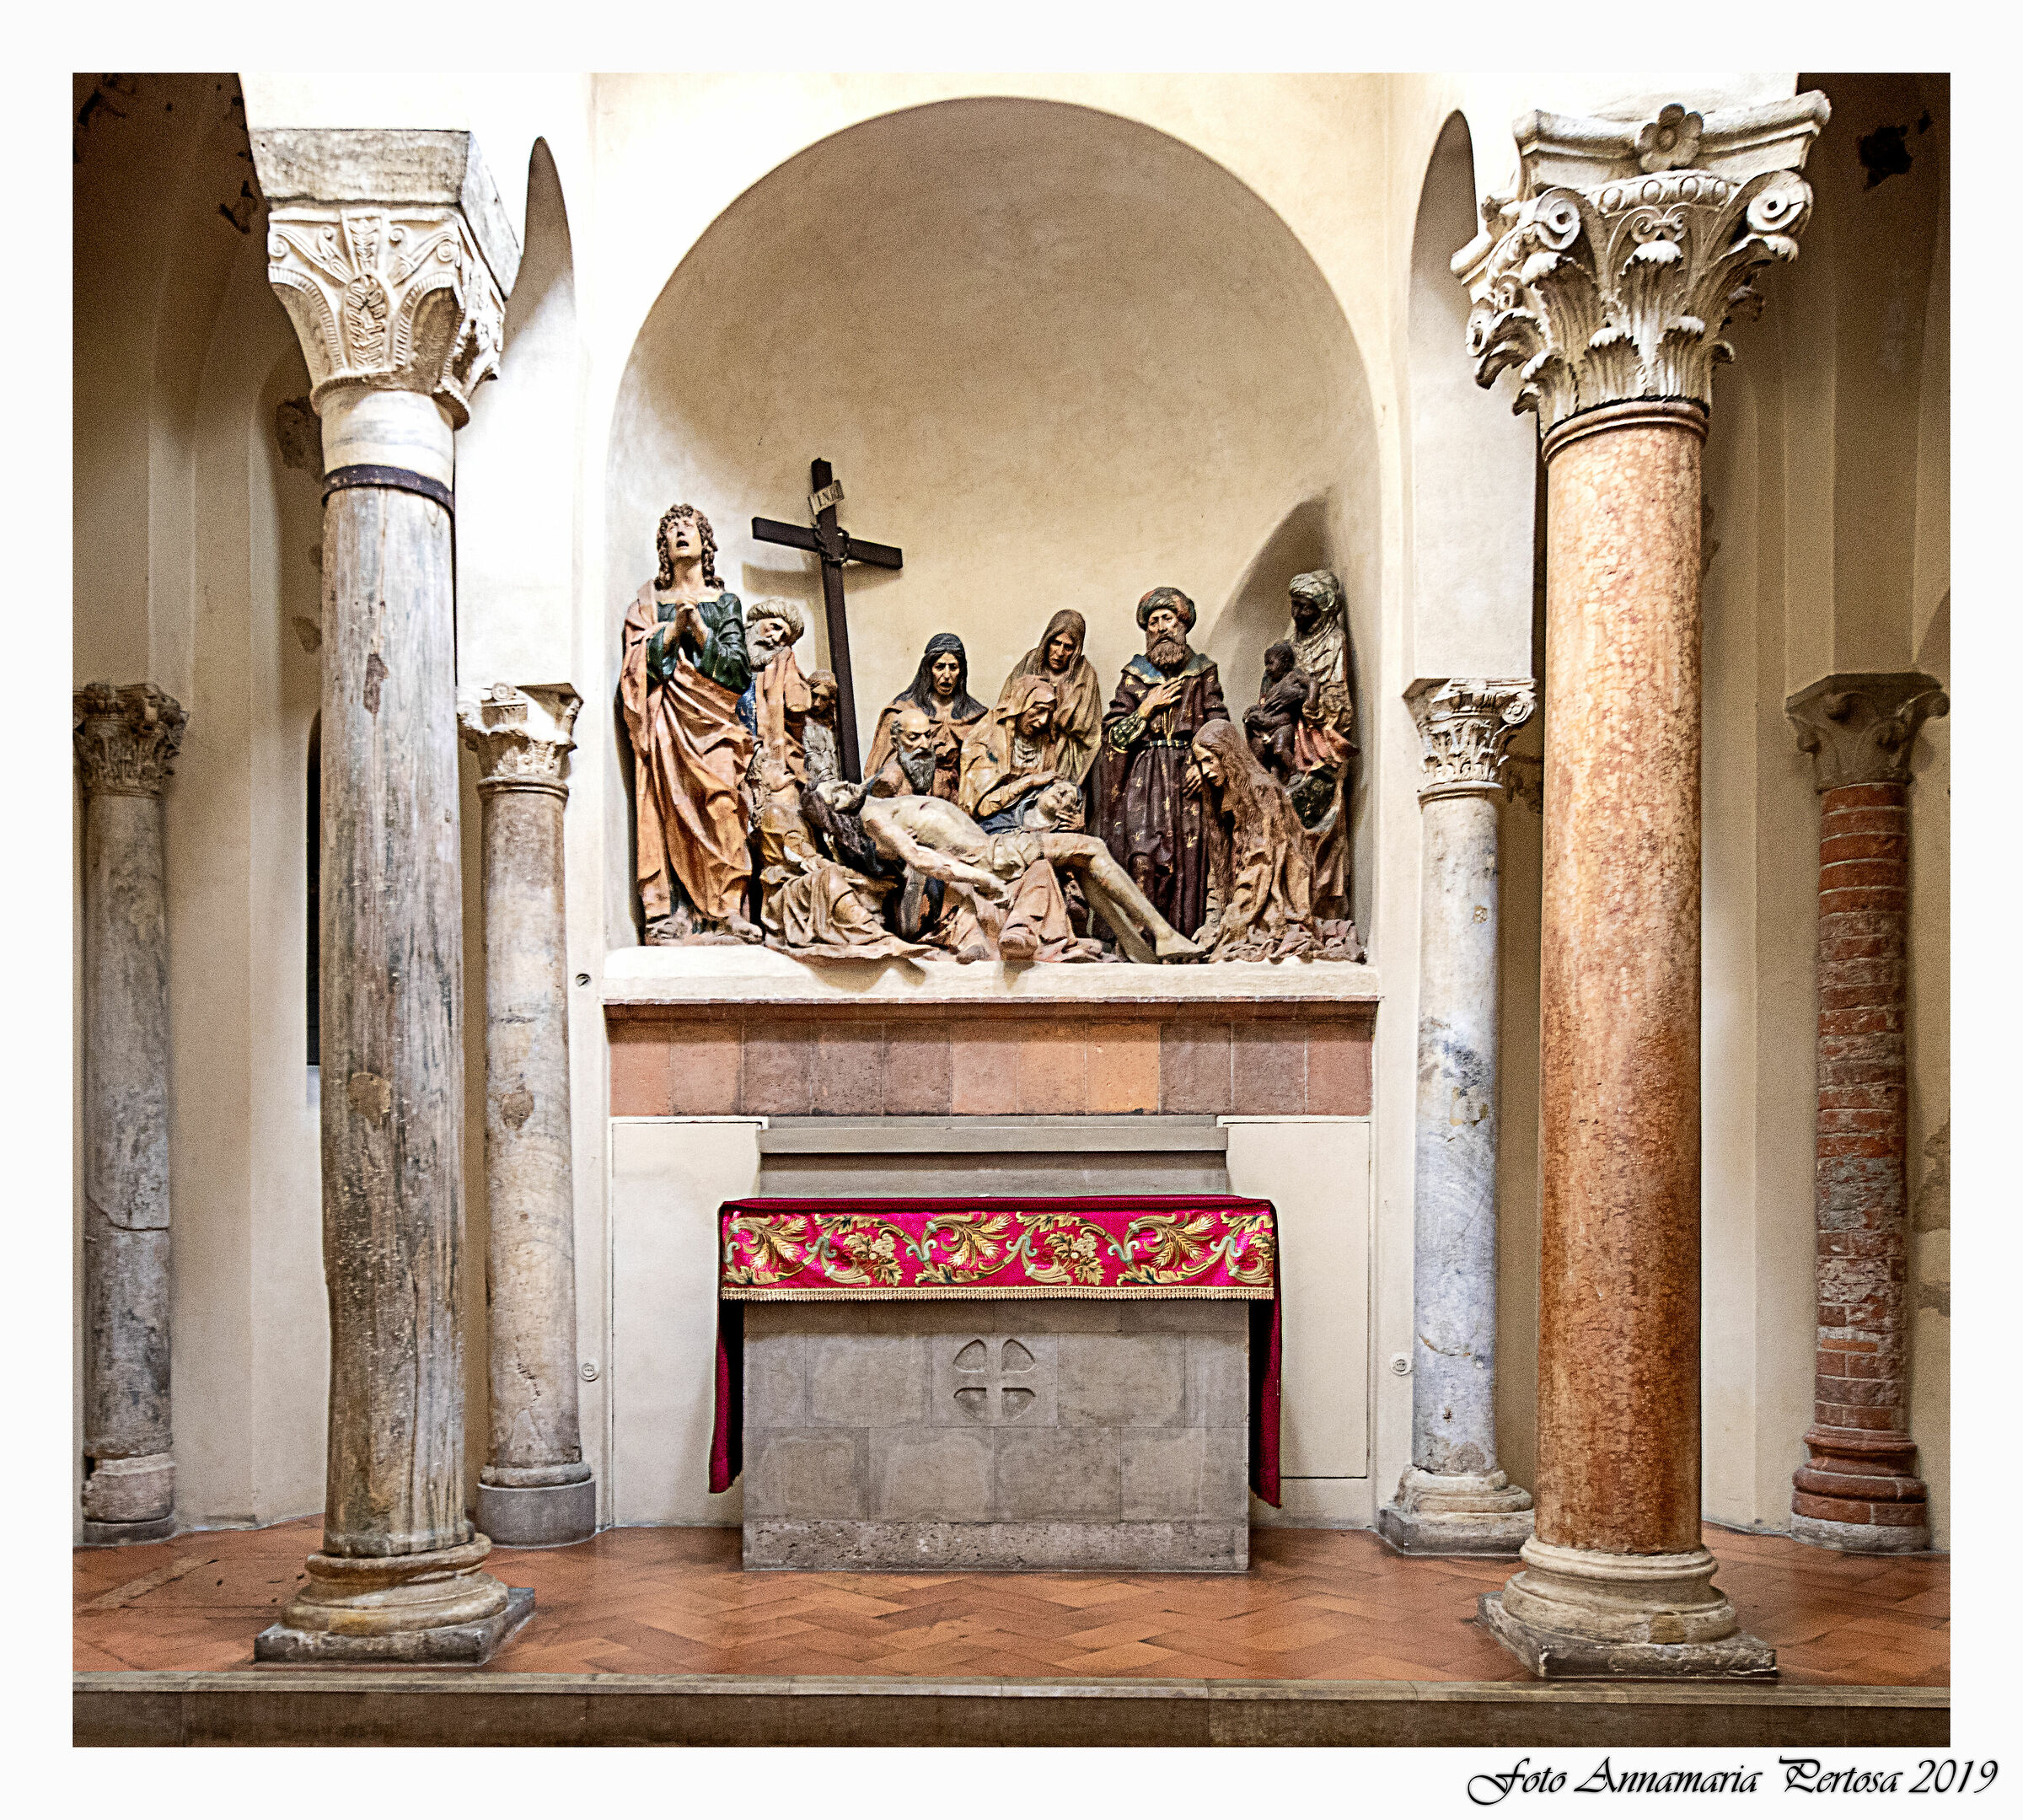 San Satiro: The group of the Pietà...